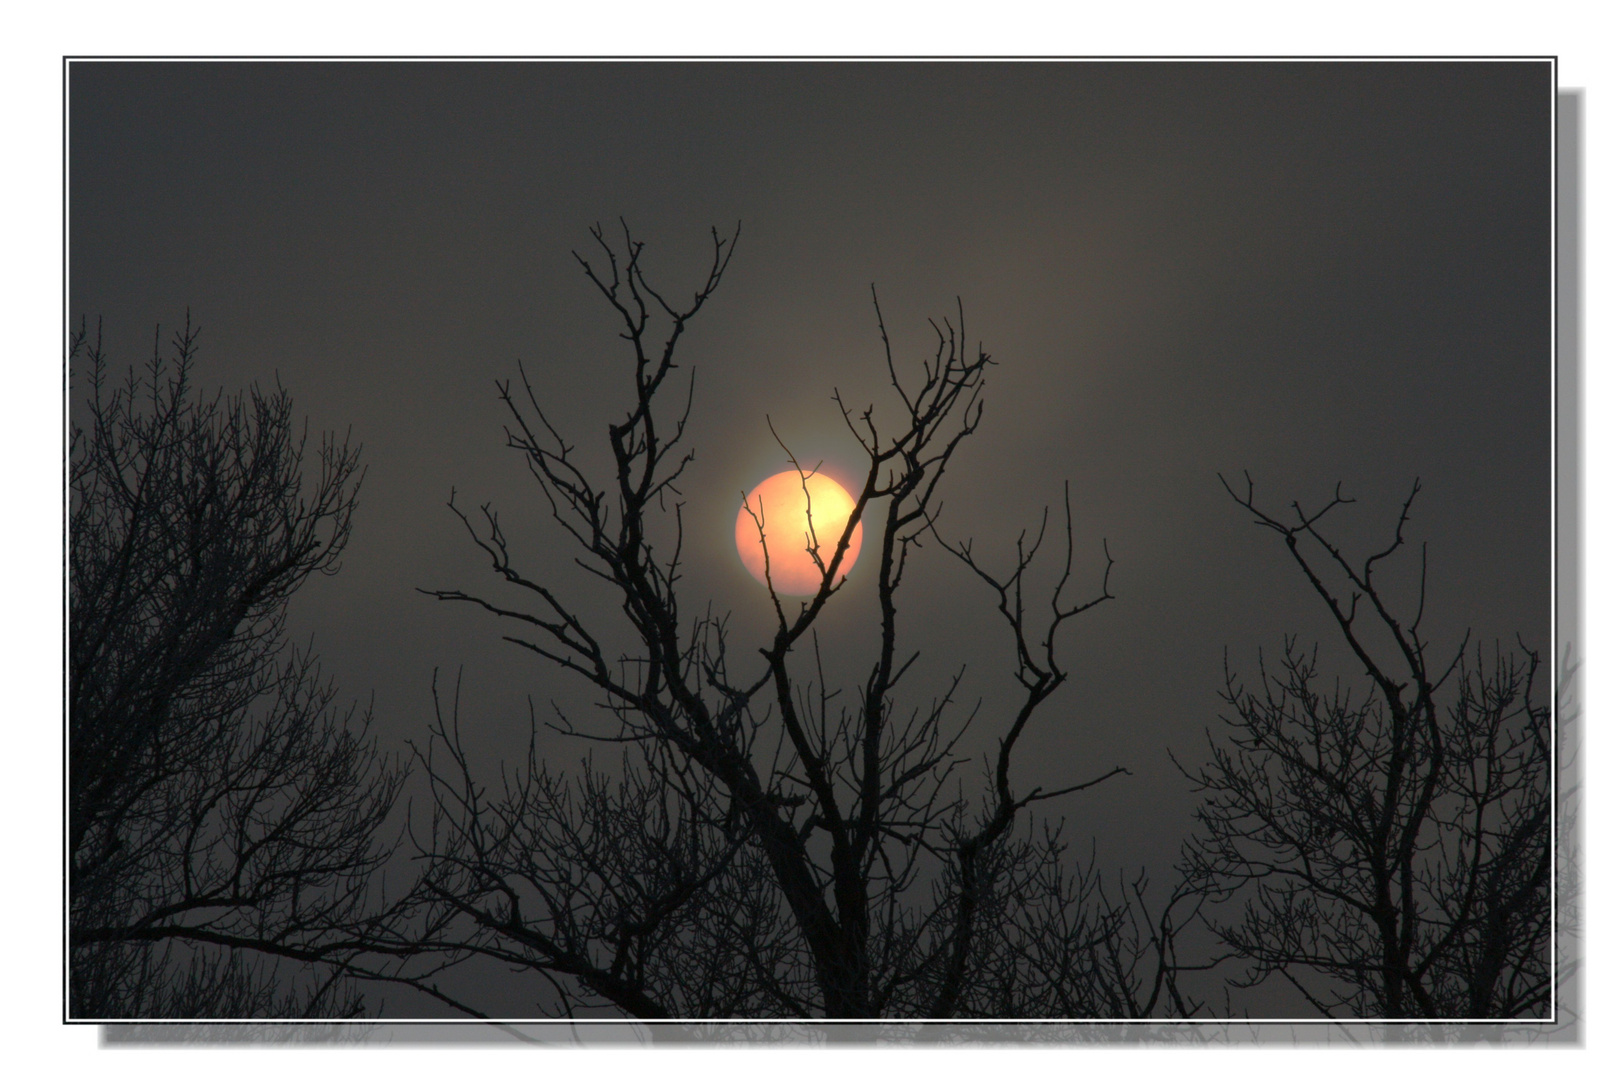 Kampf der Sonne